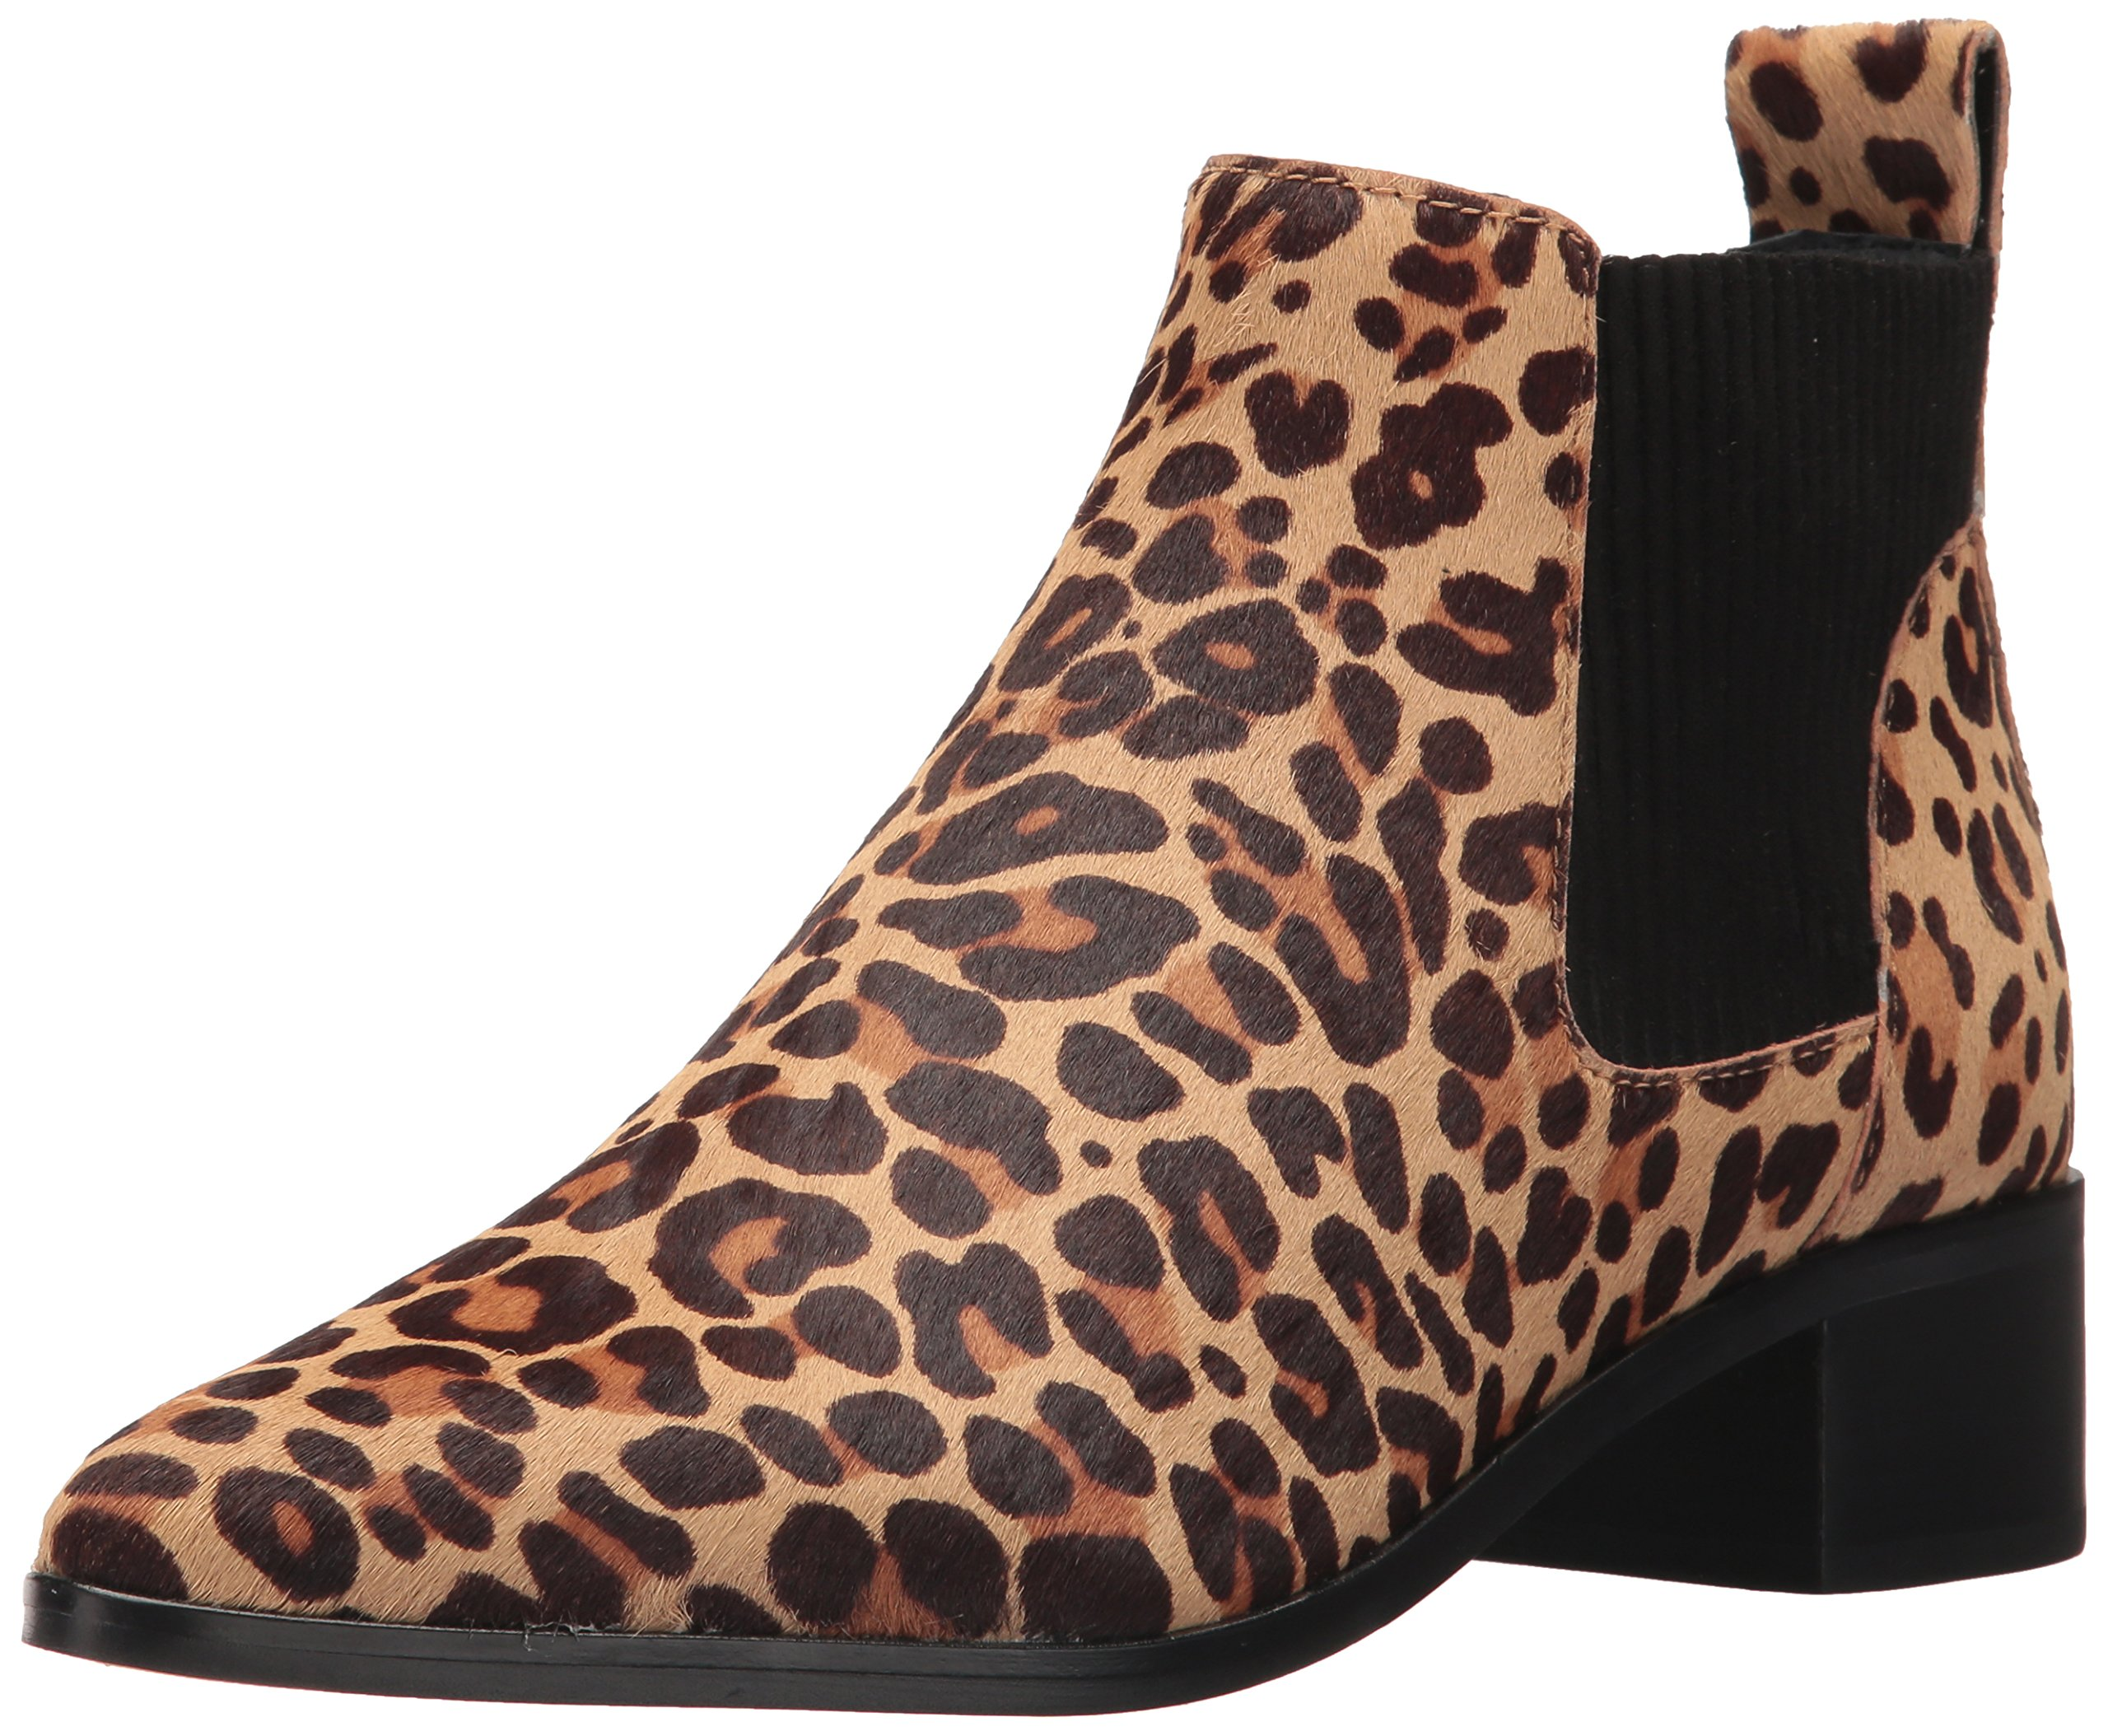 Dolce Vita Women's Macie 2 Fashion Boot, Leopard Calf Hair, 9.5 Medium US